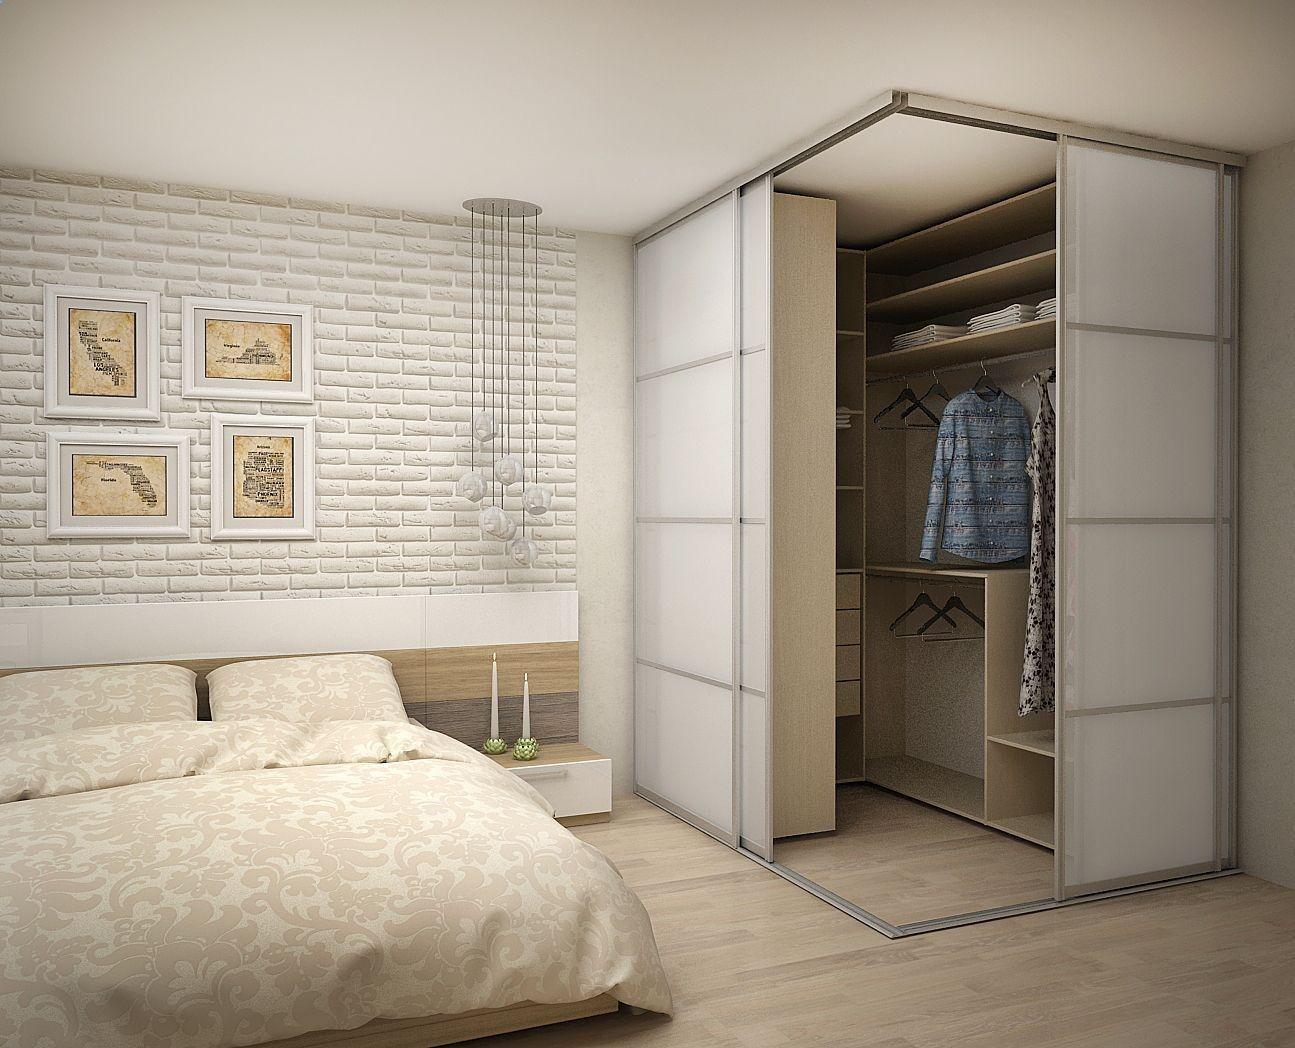 Bedroom furniture chairs cupboards design design plans dressers